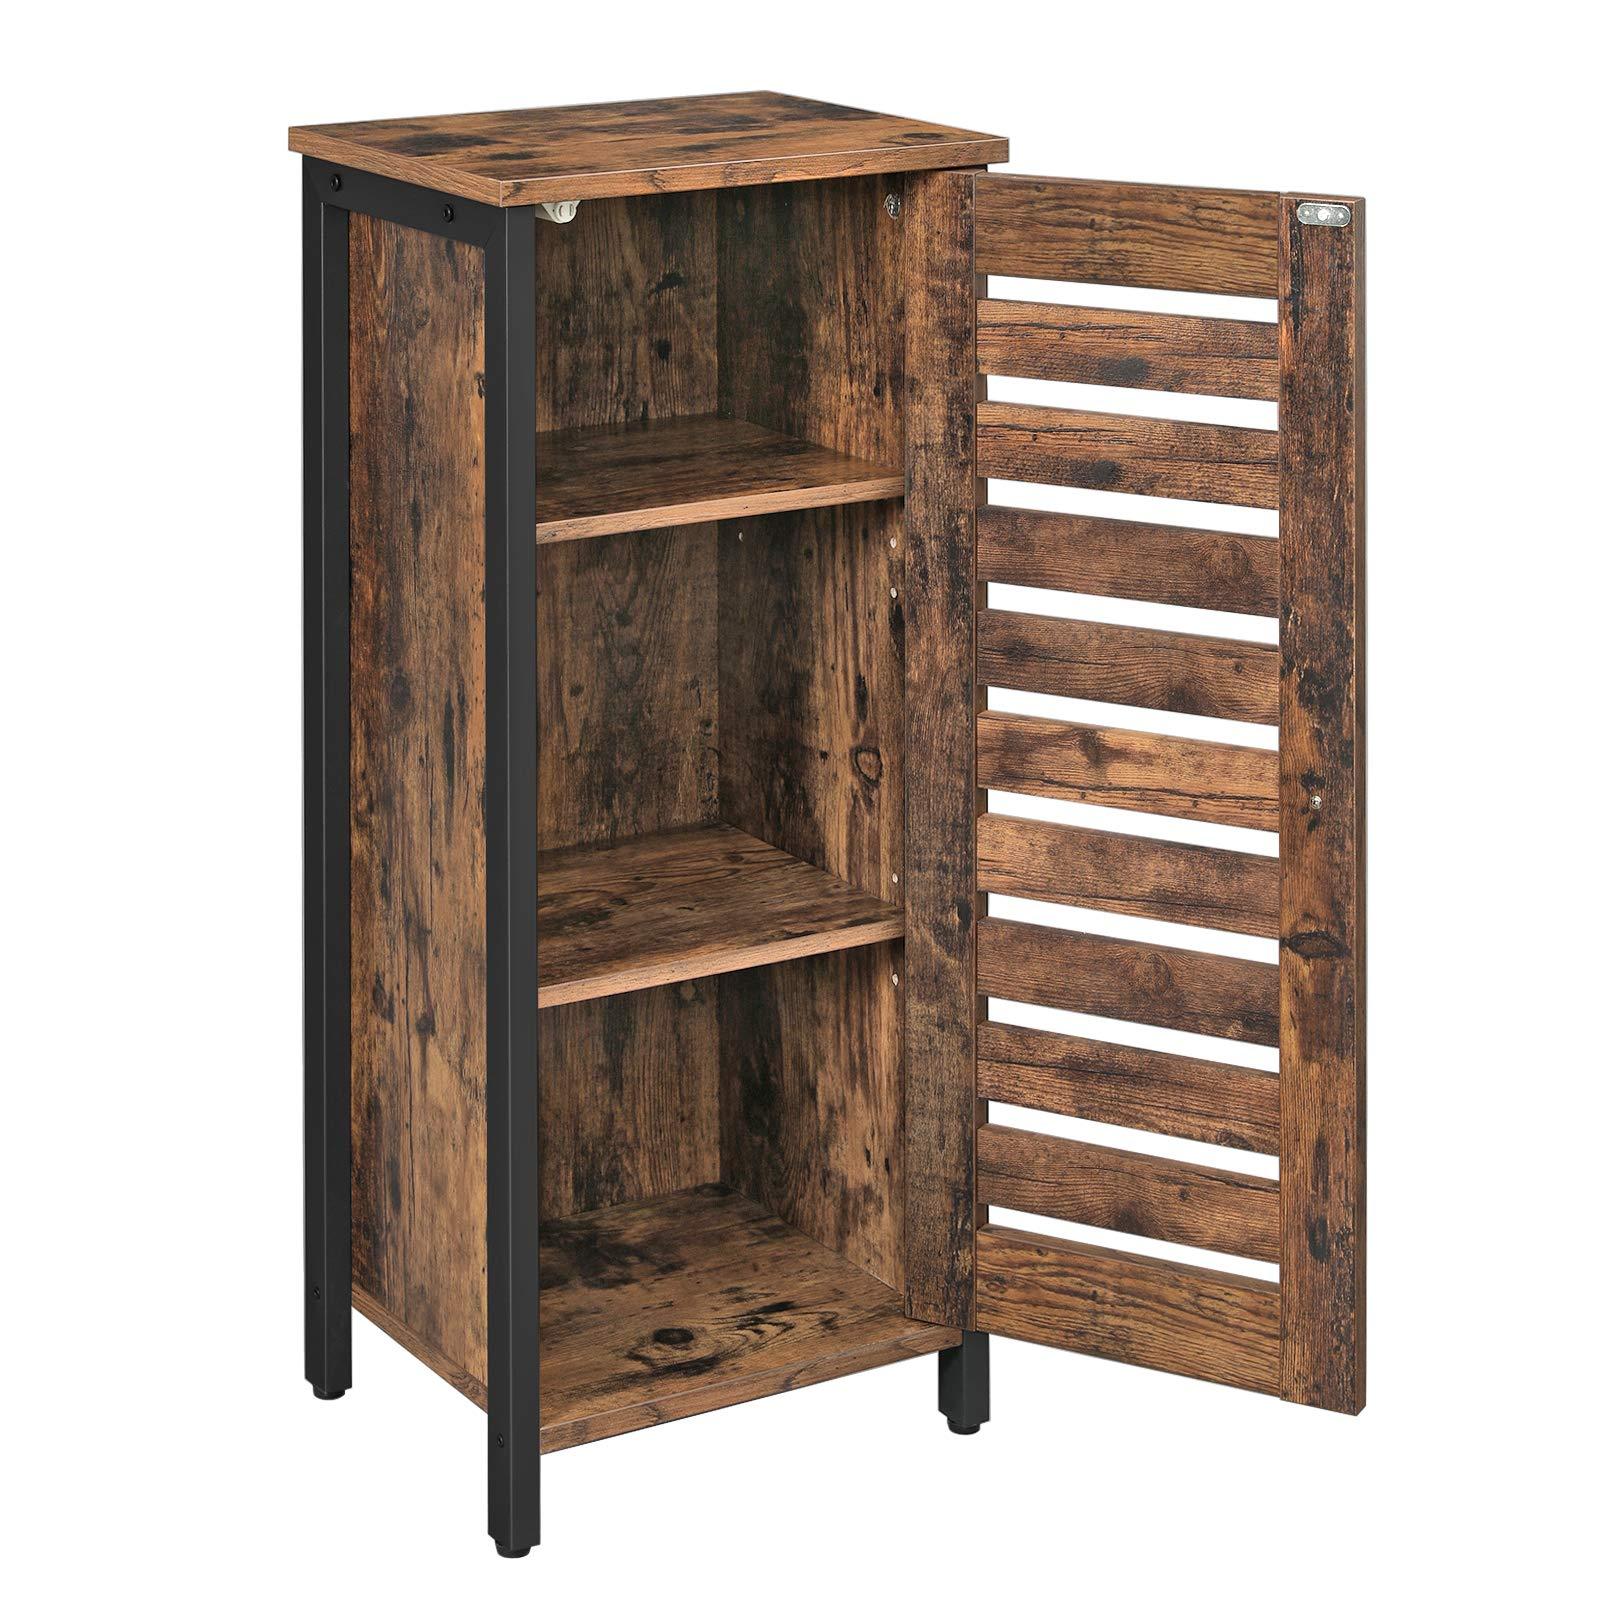 VASAGLE Side Cabinet, Floor Cabinet with 2 Shelves, Freestanding Kitchen Storage Cabinet, Louvered Door, for Living Room, Hallway, Office, Bedroom, Rustic Brown LSC35BX